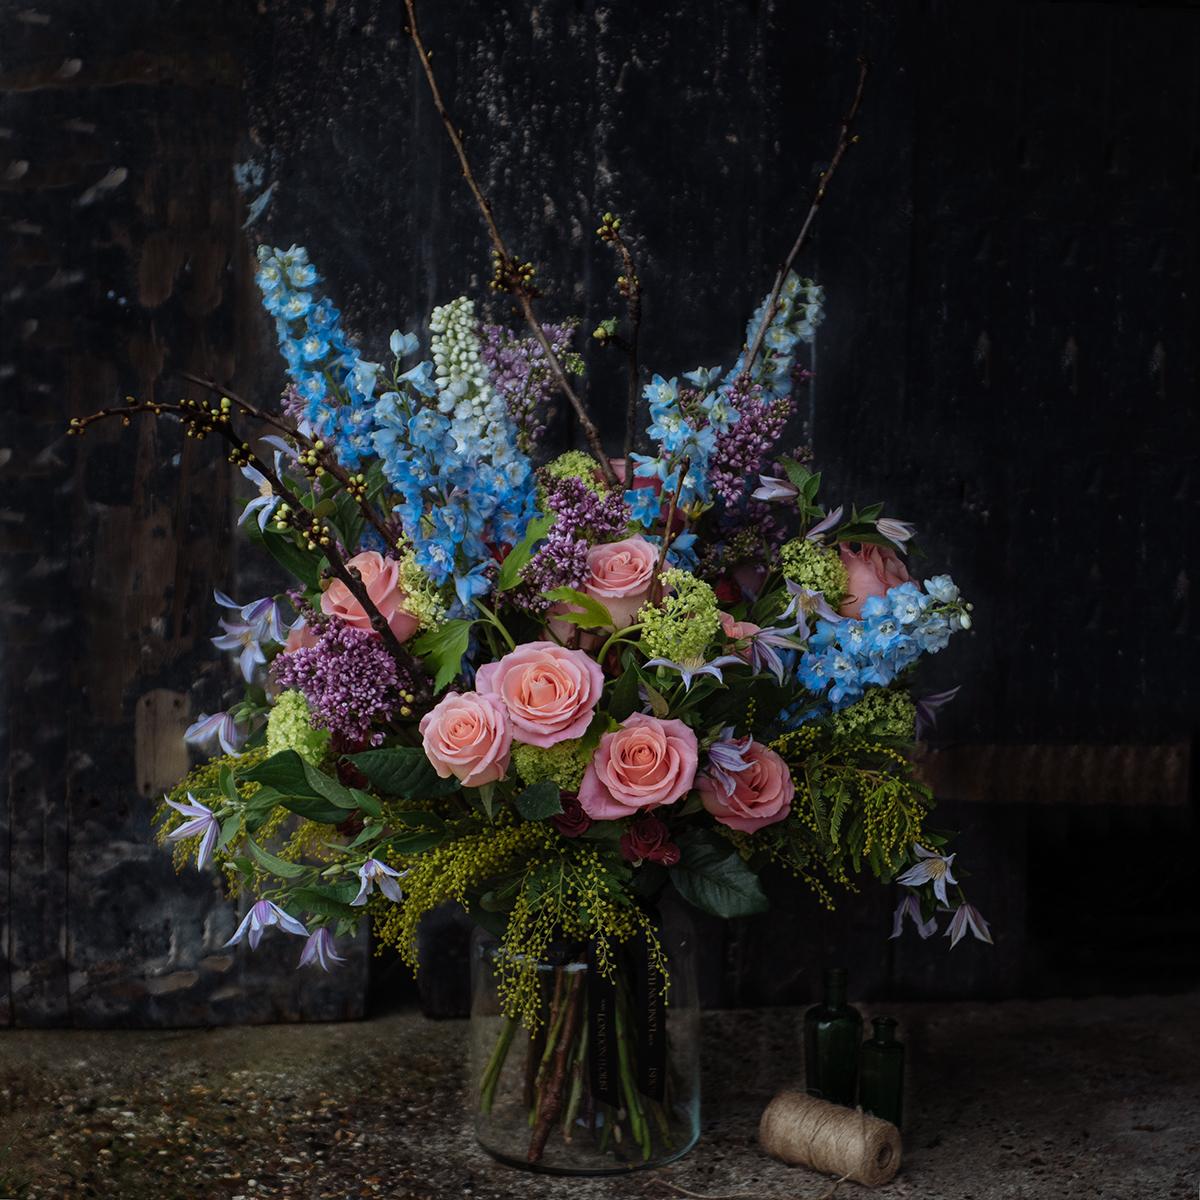 floom-your-london-florist-bouquet-648.jpg